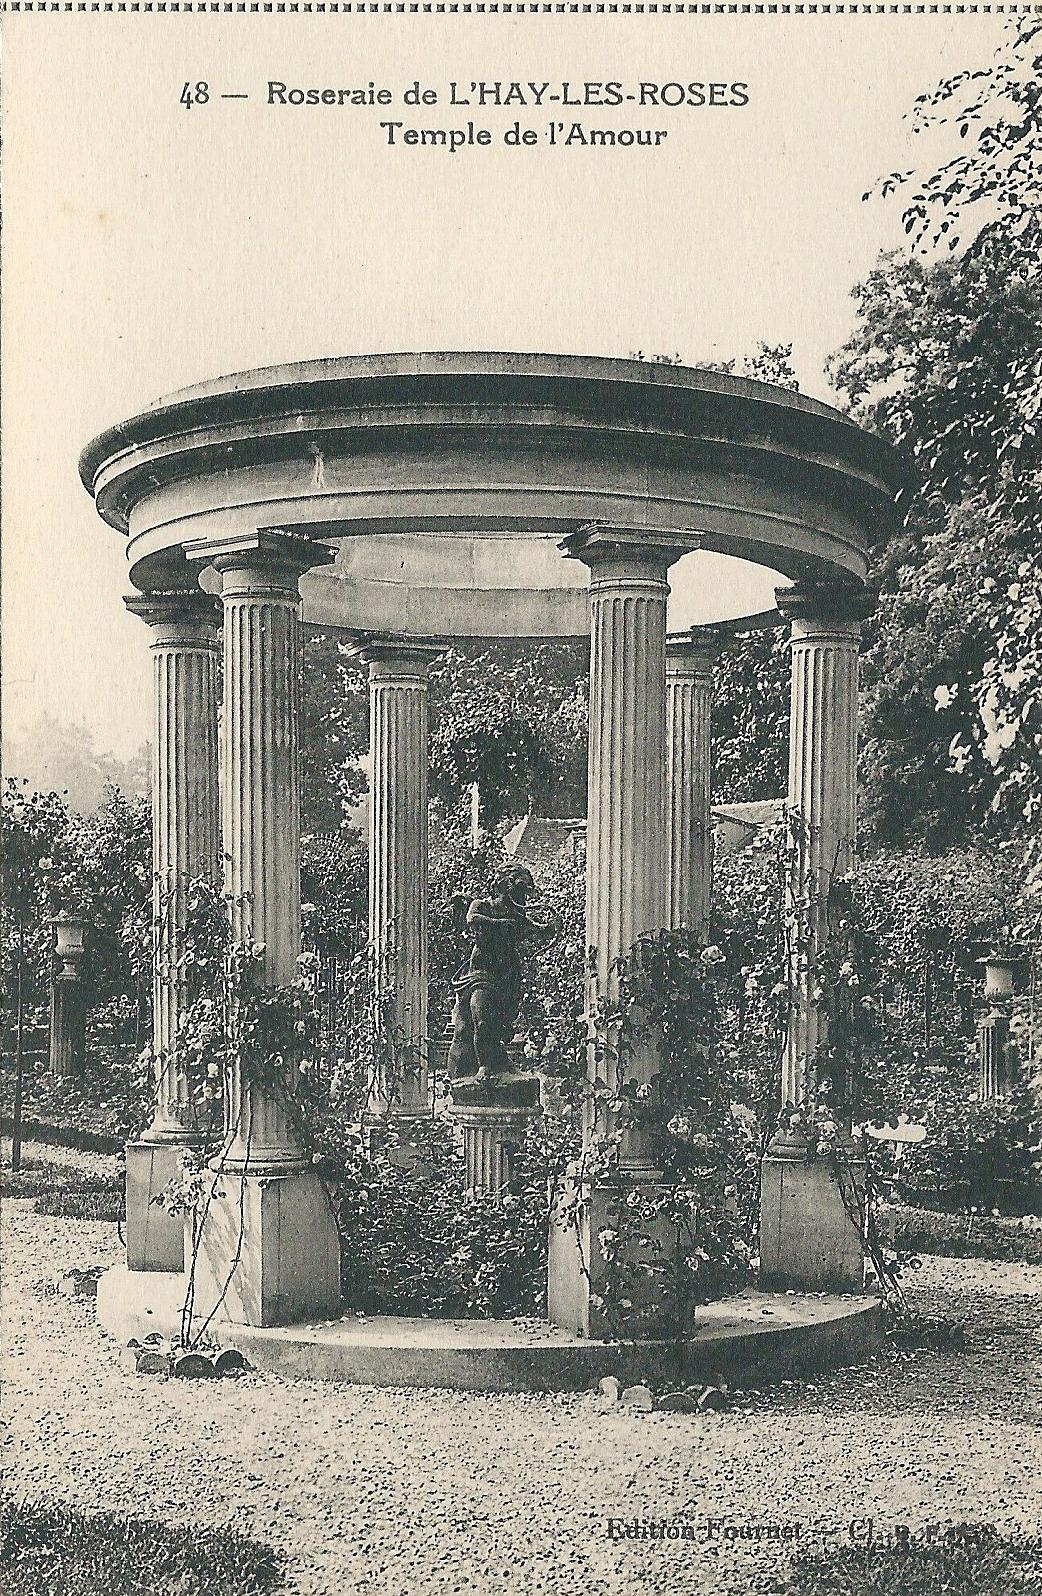 L Hay Les Roses Roseraie : roses, roseraie, File:L'Haÿ-les-Roses-FR-94-vers, 1925-La, Roseraie-17.jpg, Wikimedia, Commons